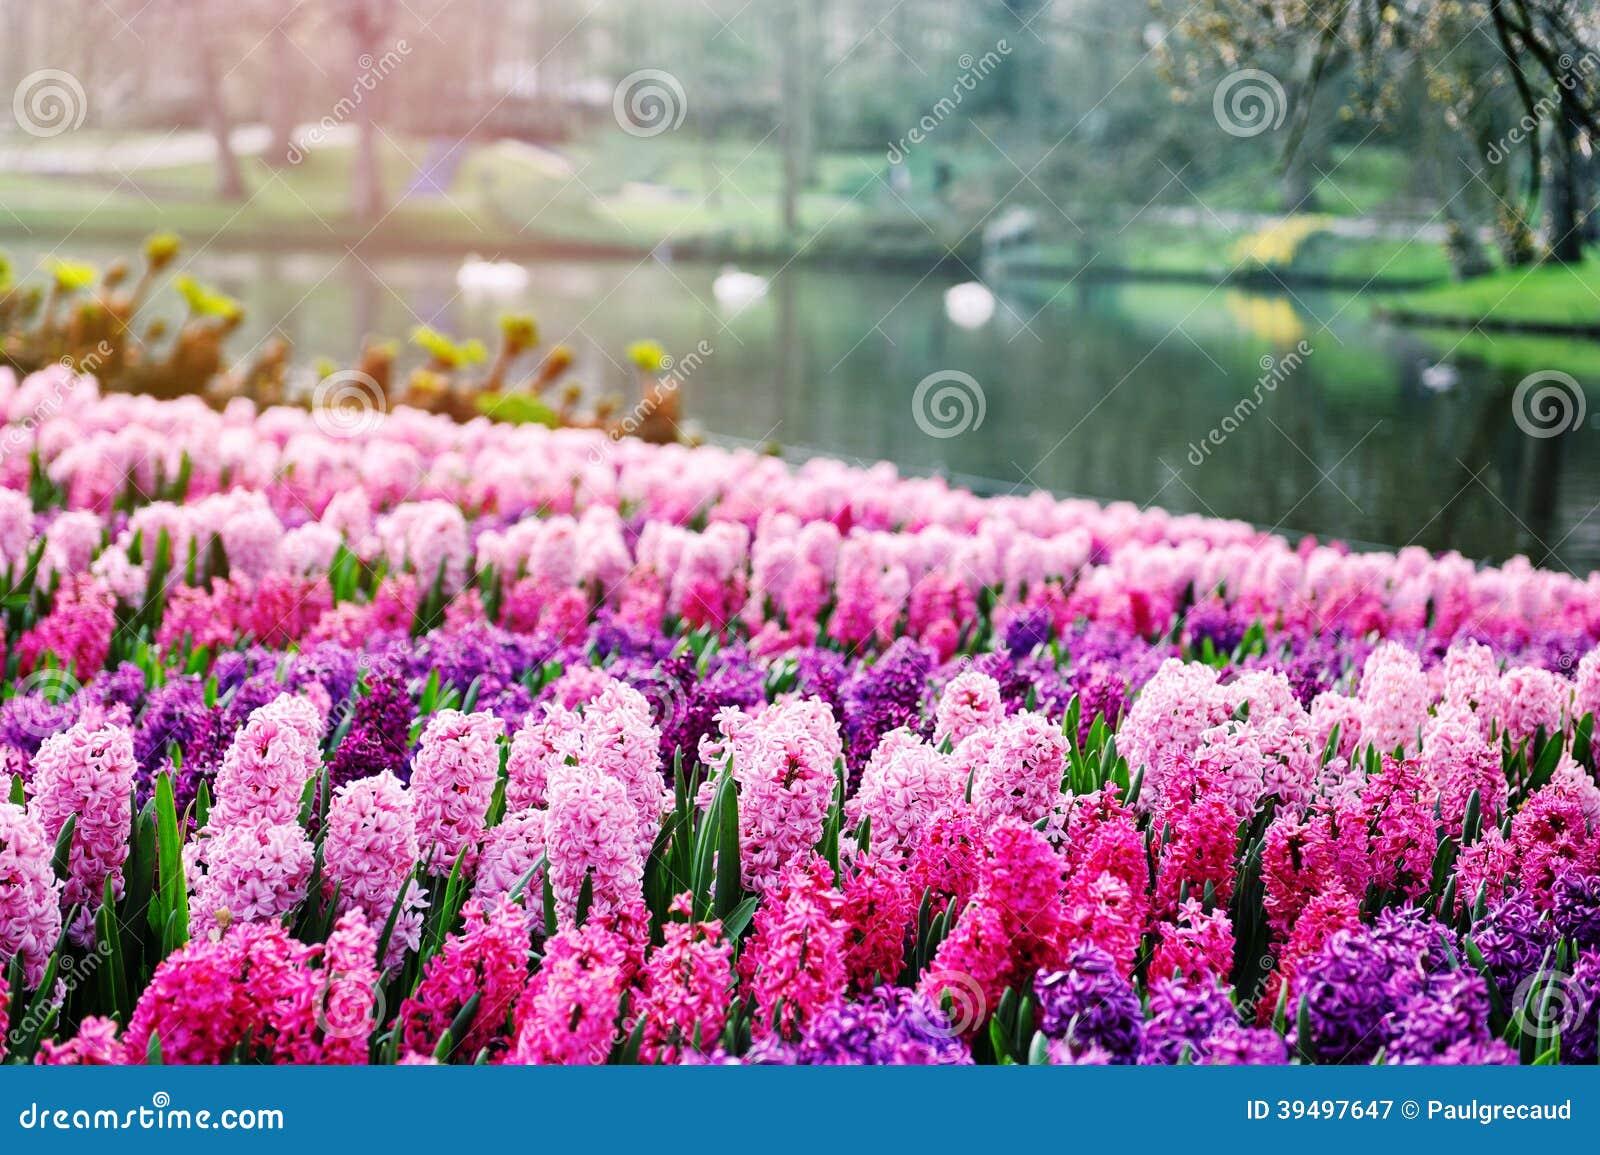 Roze hyacinten in keukenhof tuinen nederland stock afbeelding